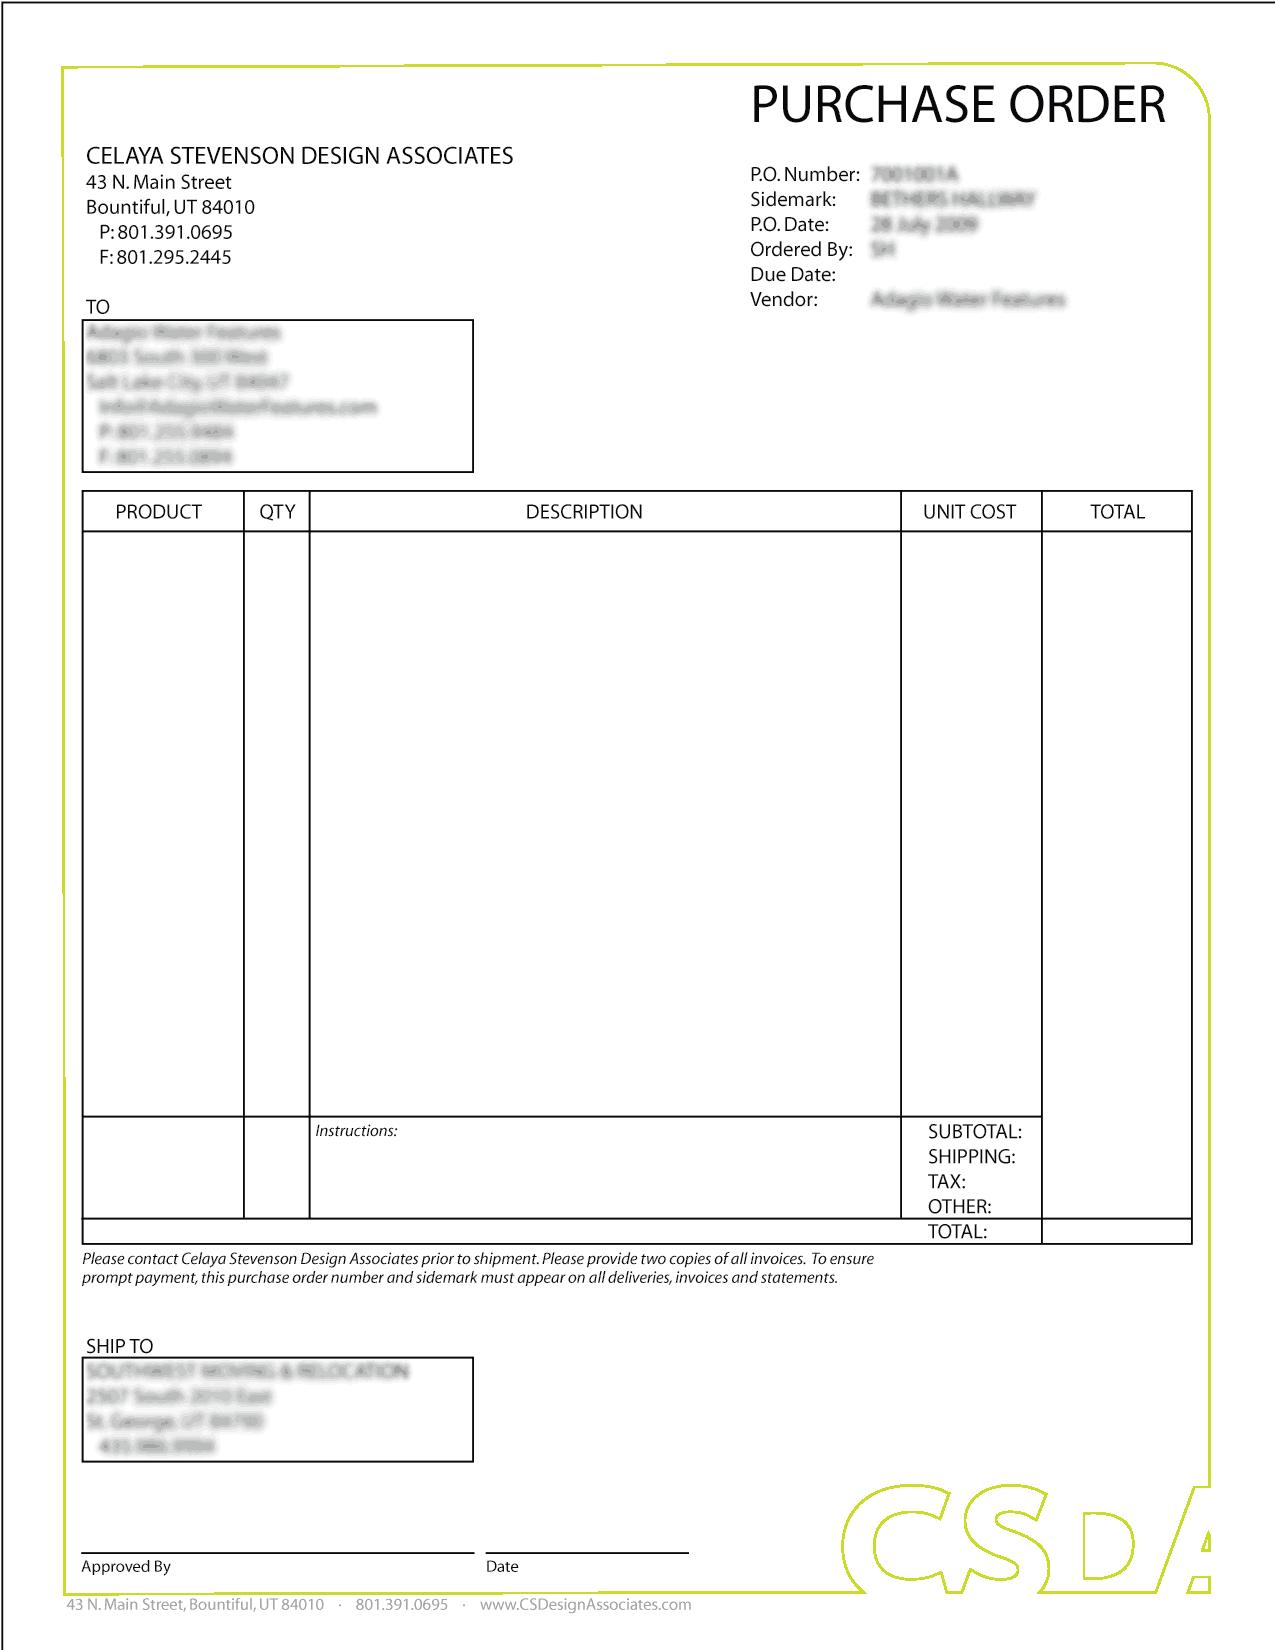 Purchase Order sample 28.9641